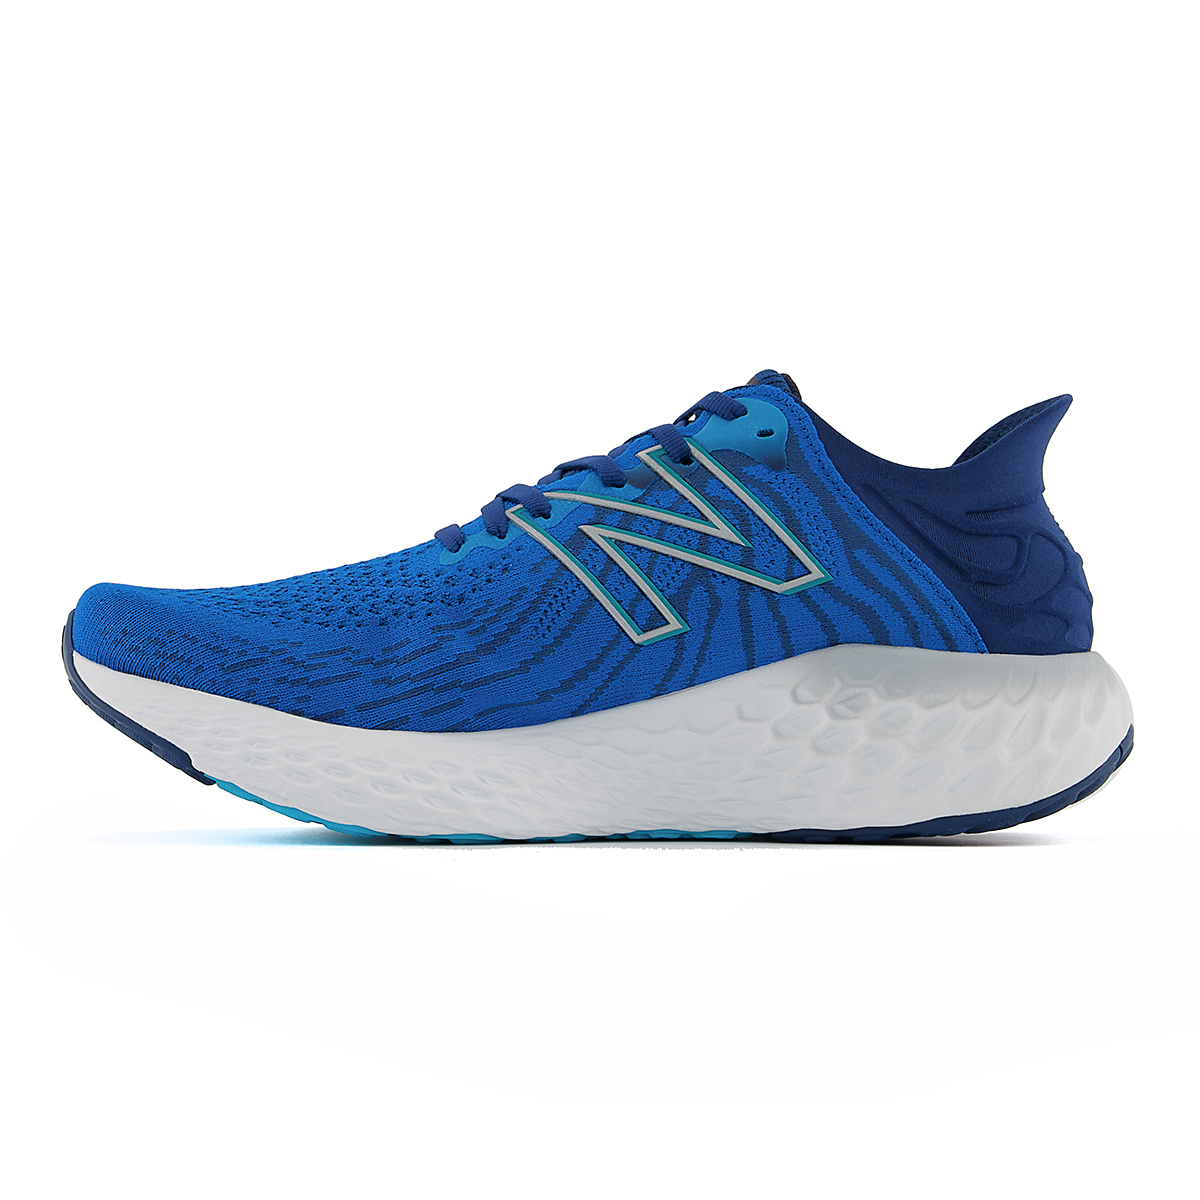 Men's New Balance Fresh Foam 1080v11 Running Shoe - Color: Wave/Light Rogue Wave - Size: 6 - Width: Wide, Wave/Light Rogue Wave, large, image 2